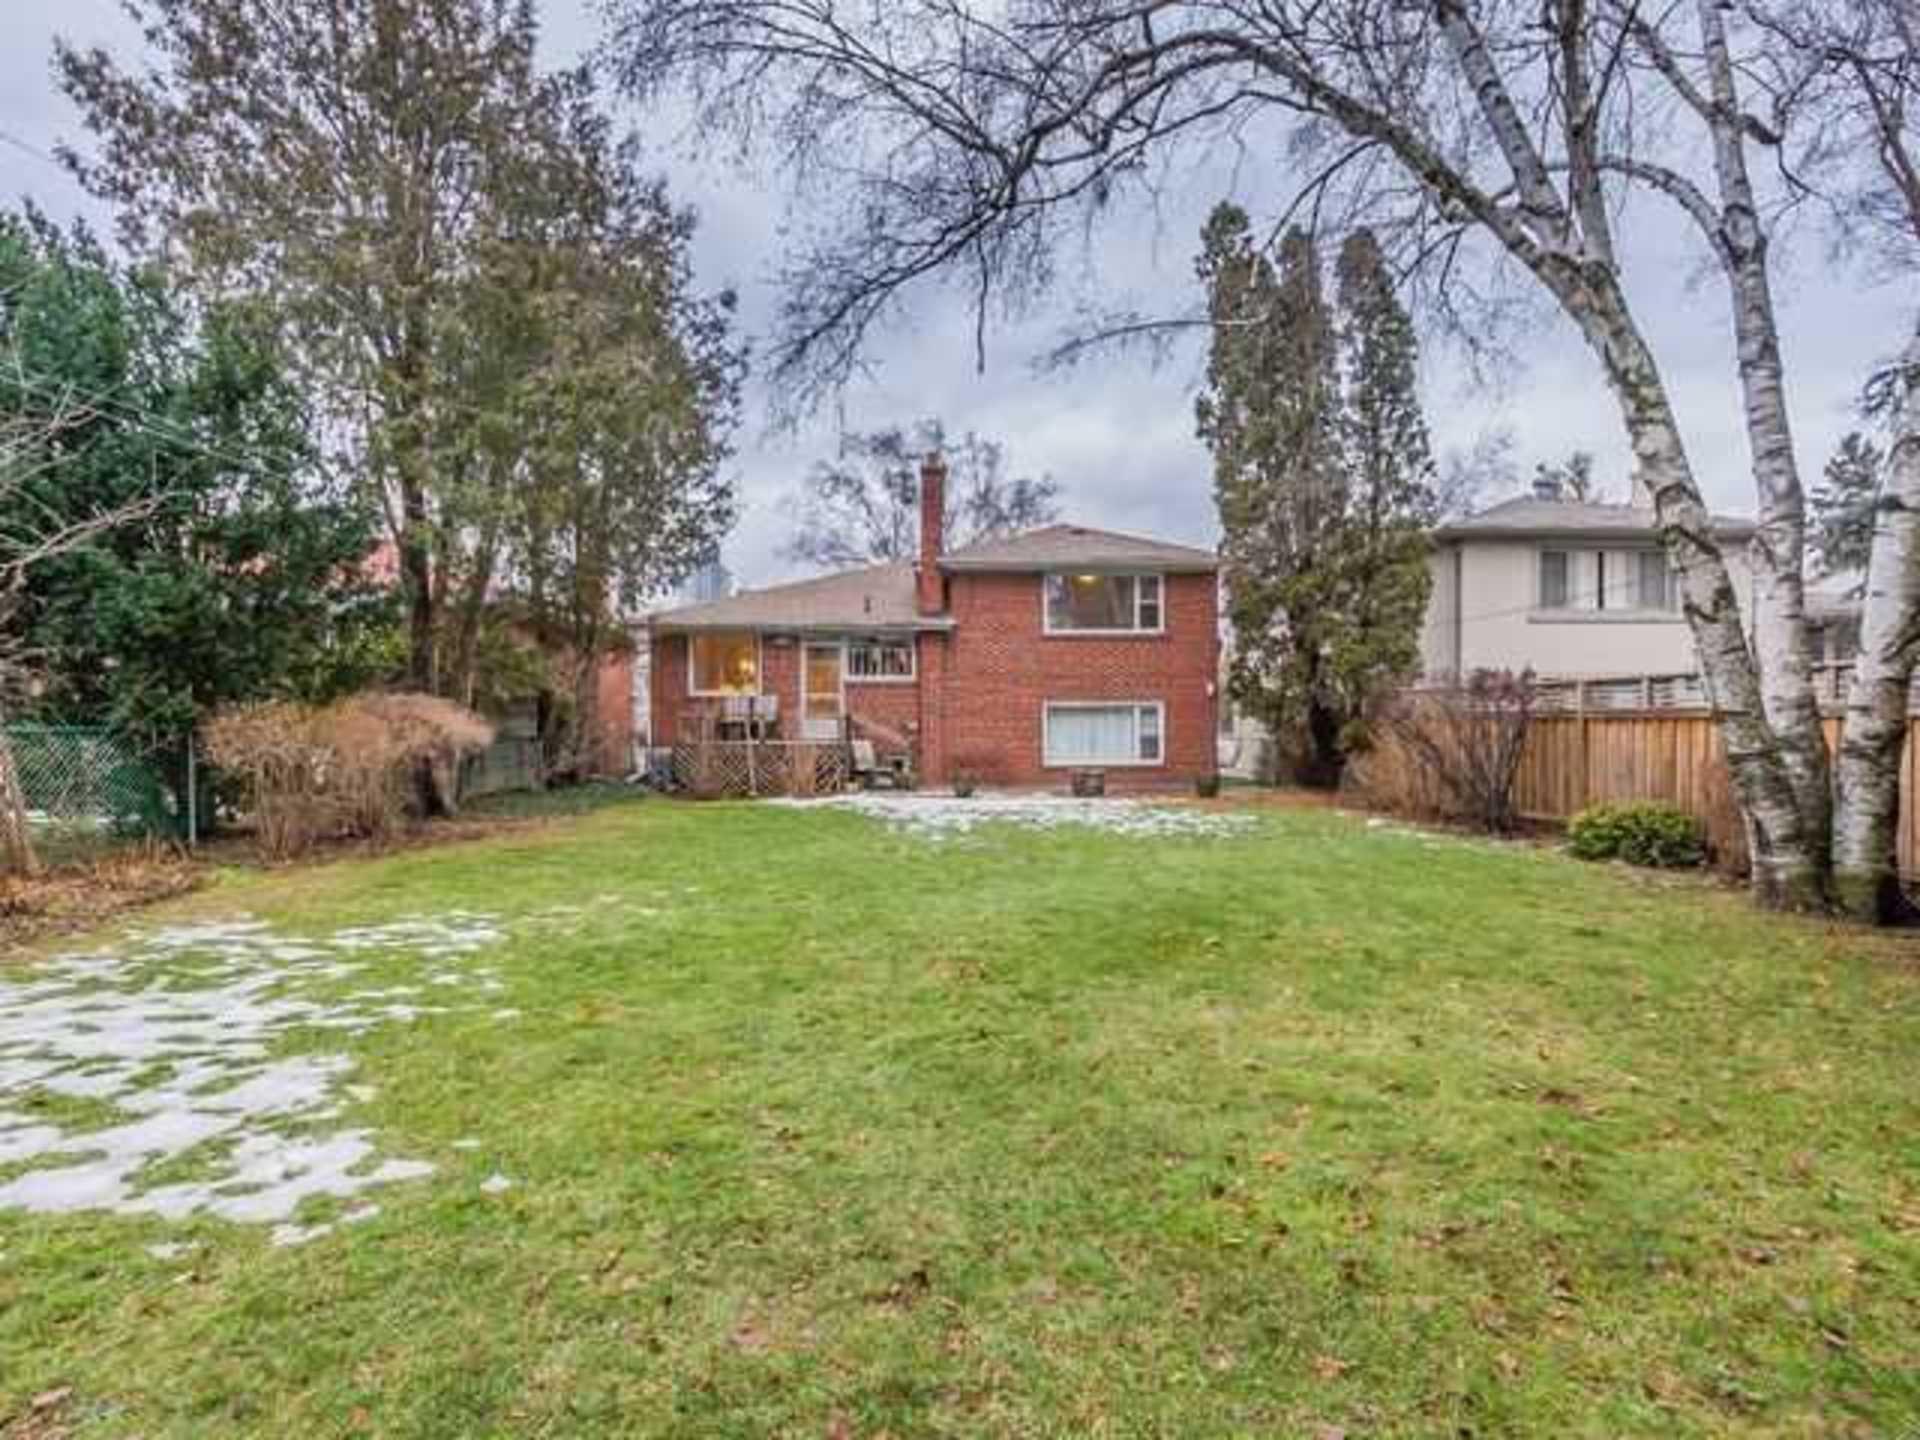 c3681656_2 at SALE # 450 - 14 Arrowstook Road, Bayview Village, Toronto